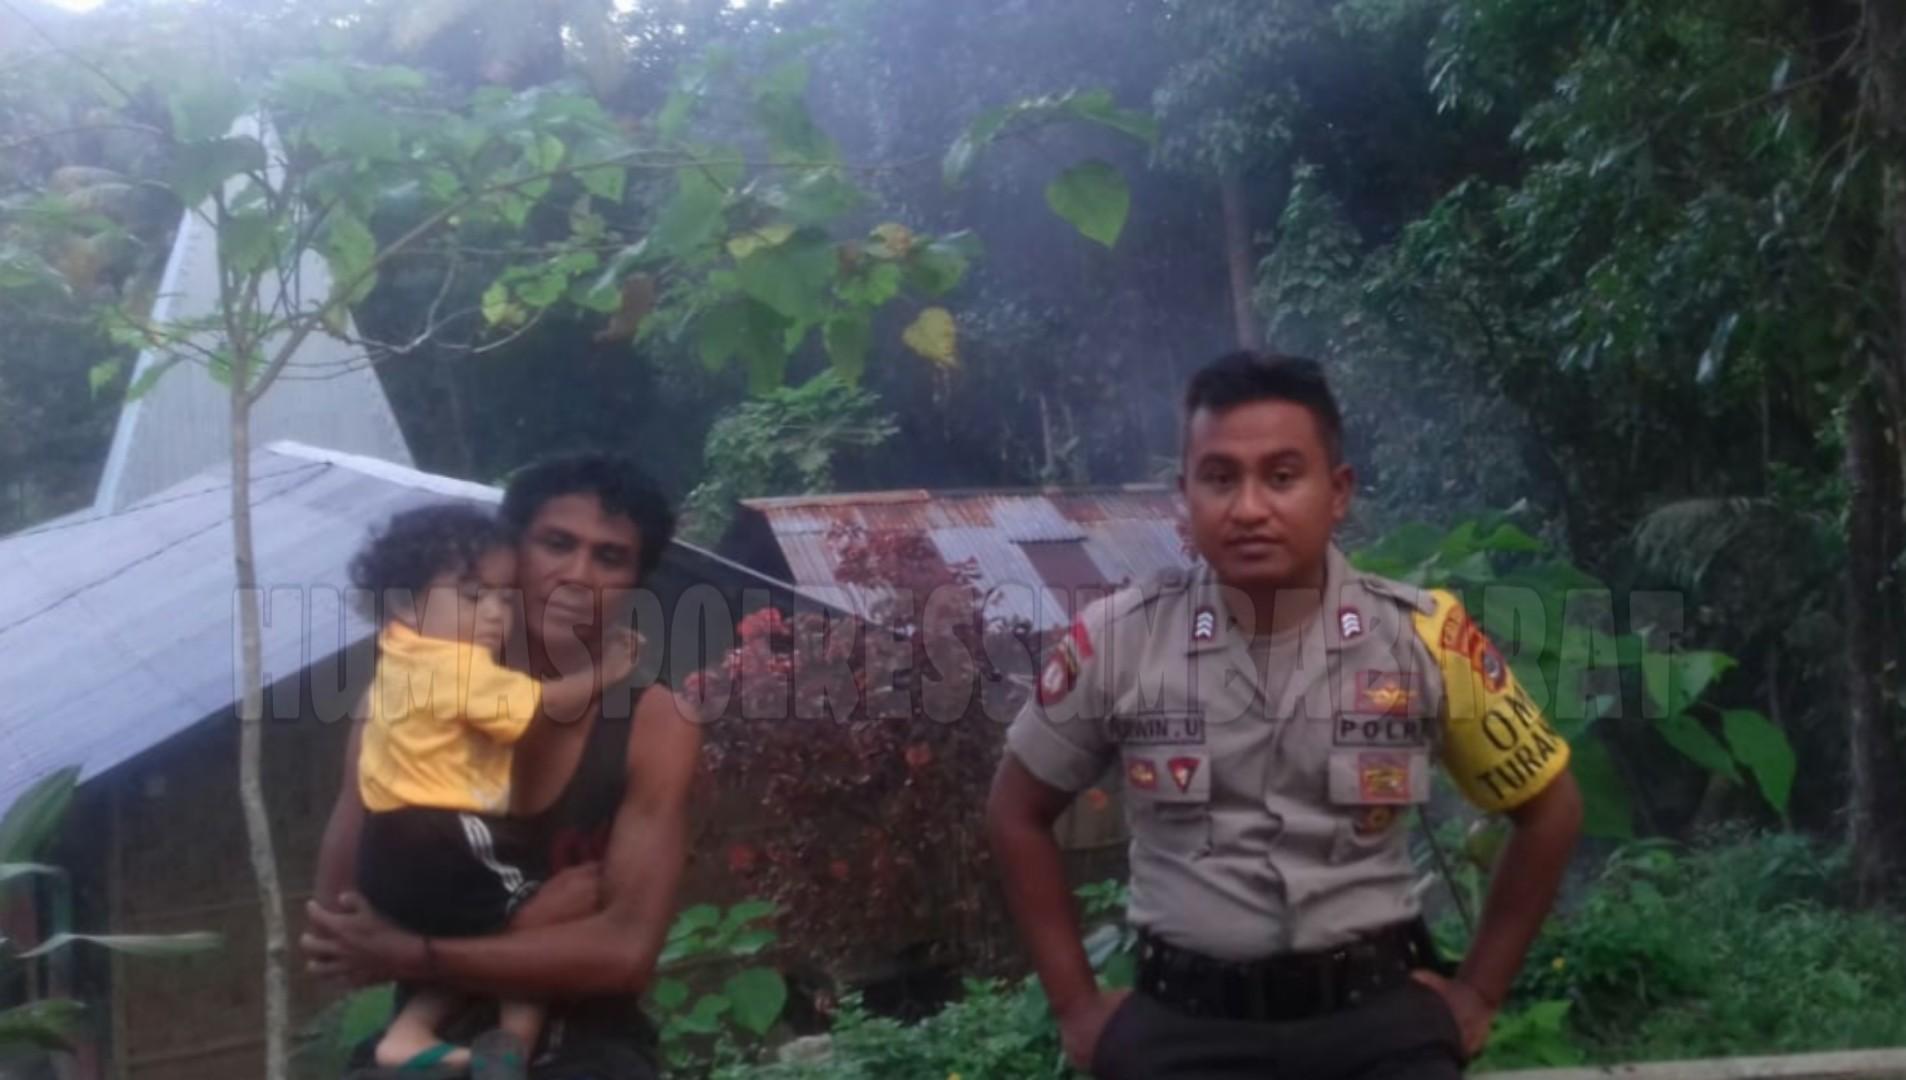 Brigpol Erwin Ajak Warga Binaan Jaga Kestabilan Situasi Kamtibmas Desa Ngadu Olu